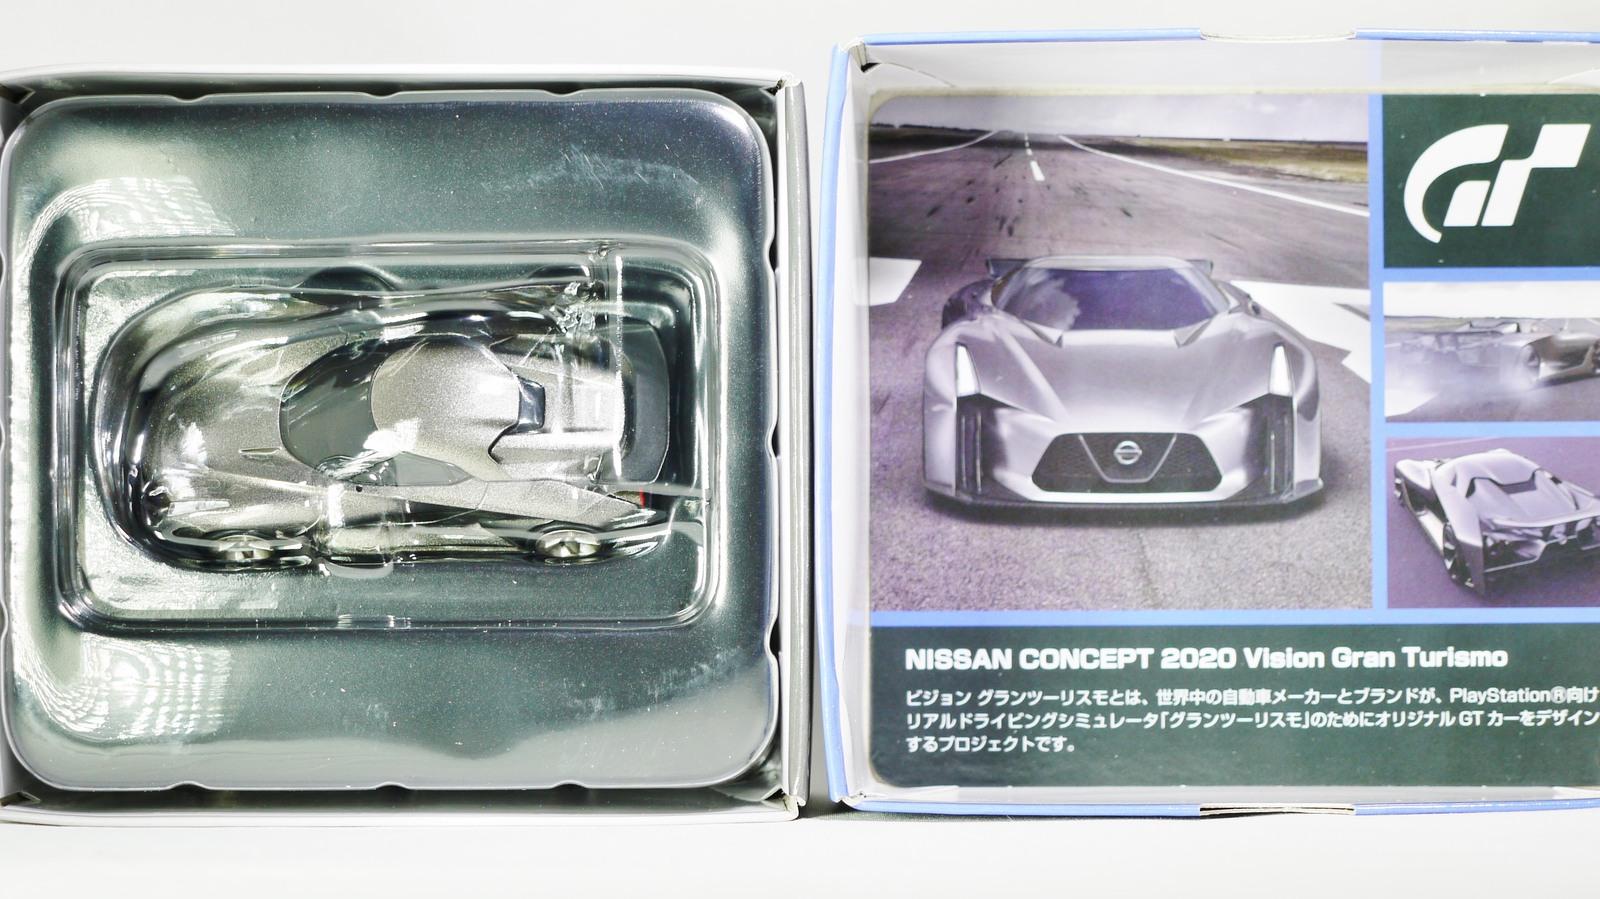 TOMICA TOMYTEC VINTAGE NEO GT NISSAN CONCEPT 2020 Vision Gran Turismo Grey